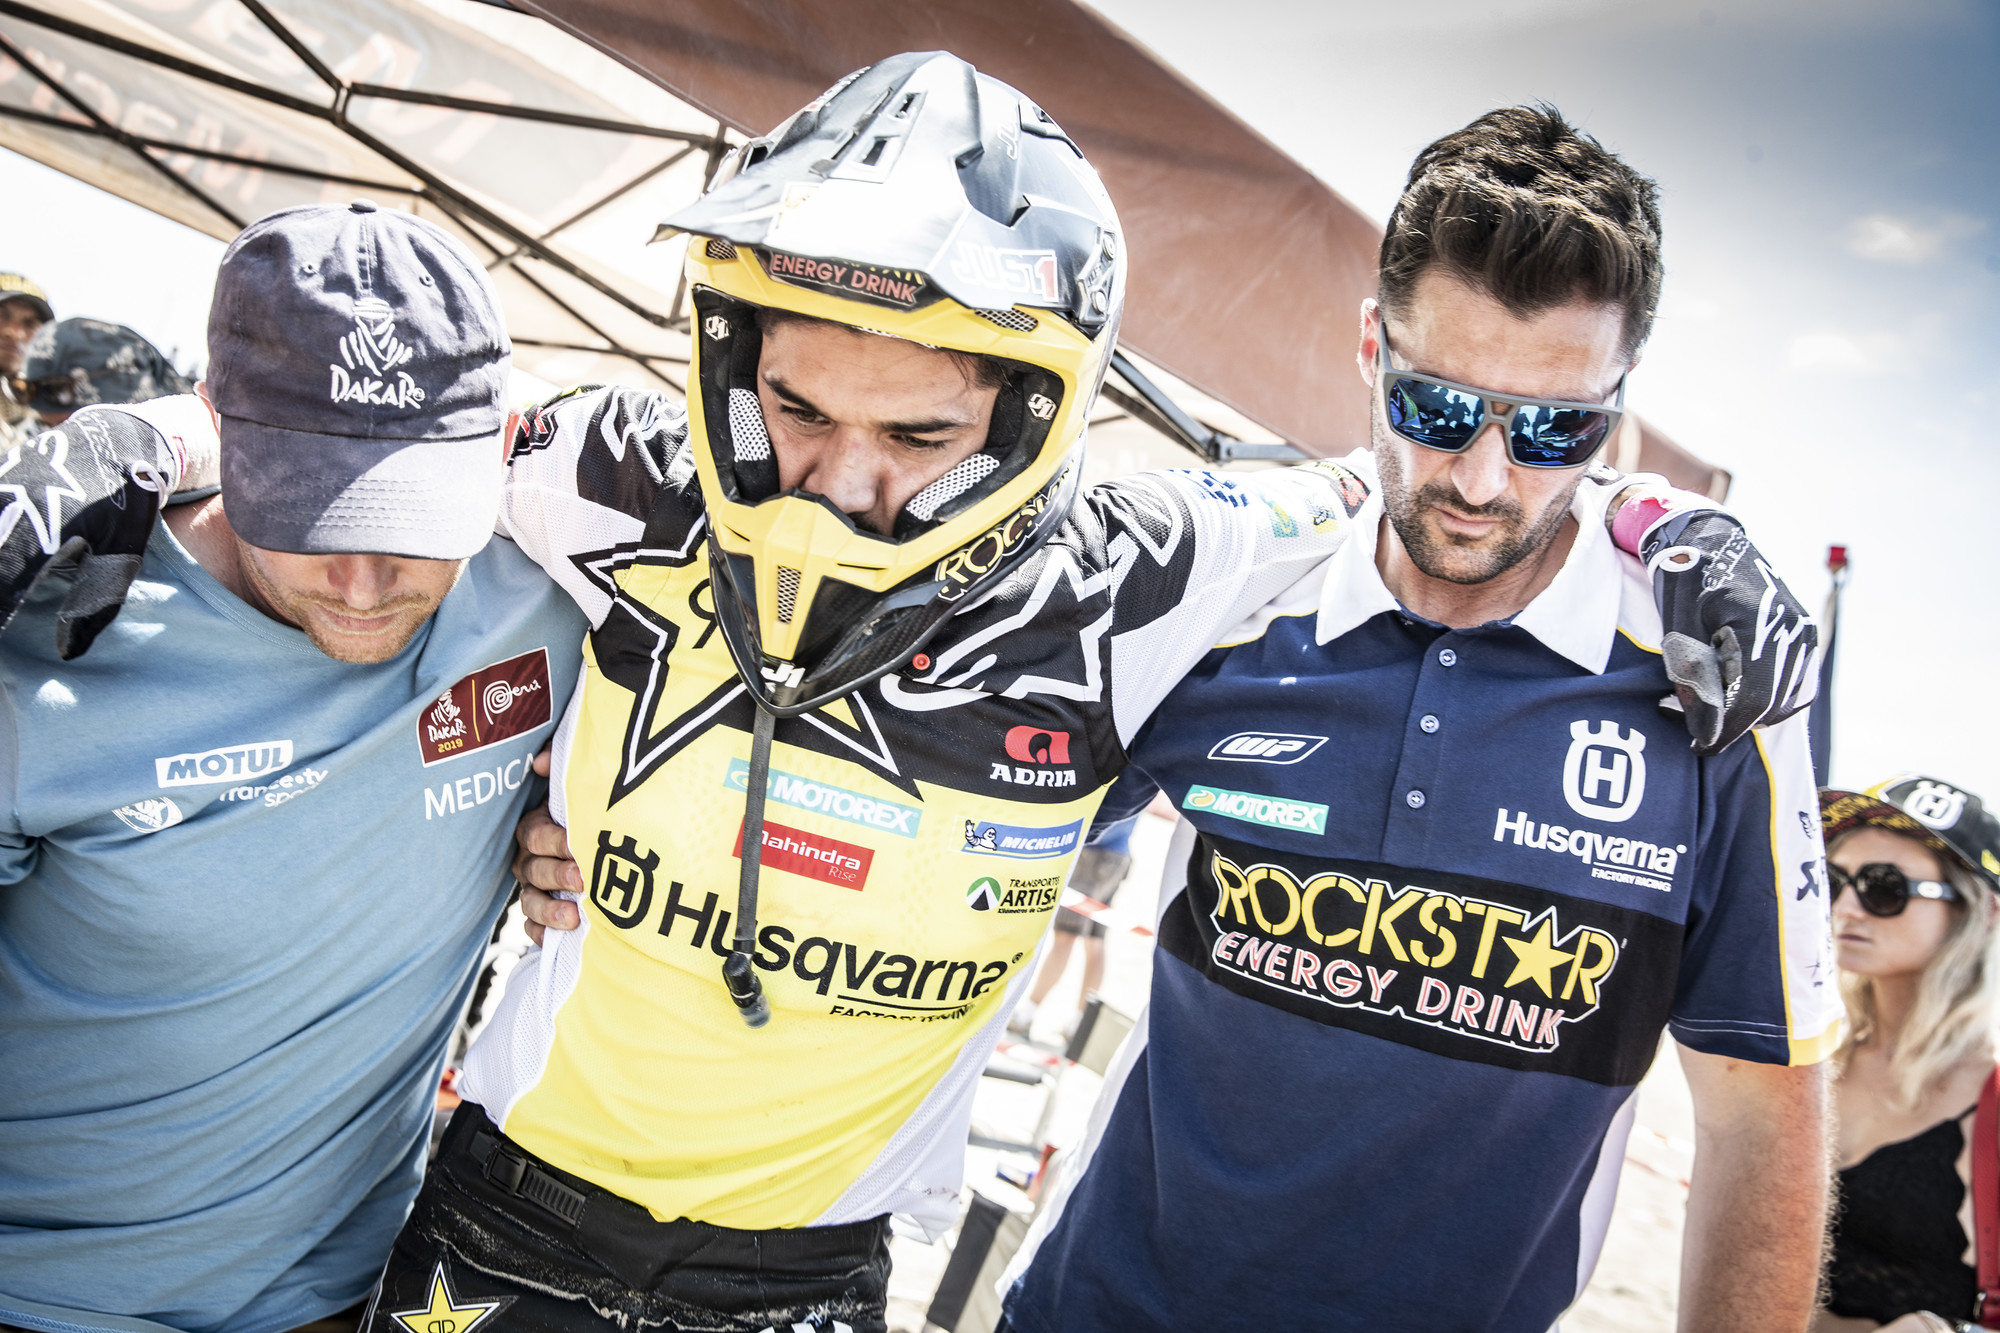 55668_pablo.quintanilla_stage10_Rockstar Energy Husqvarna Factory Racing_Dakar2019_152.jpg